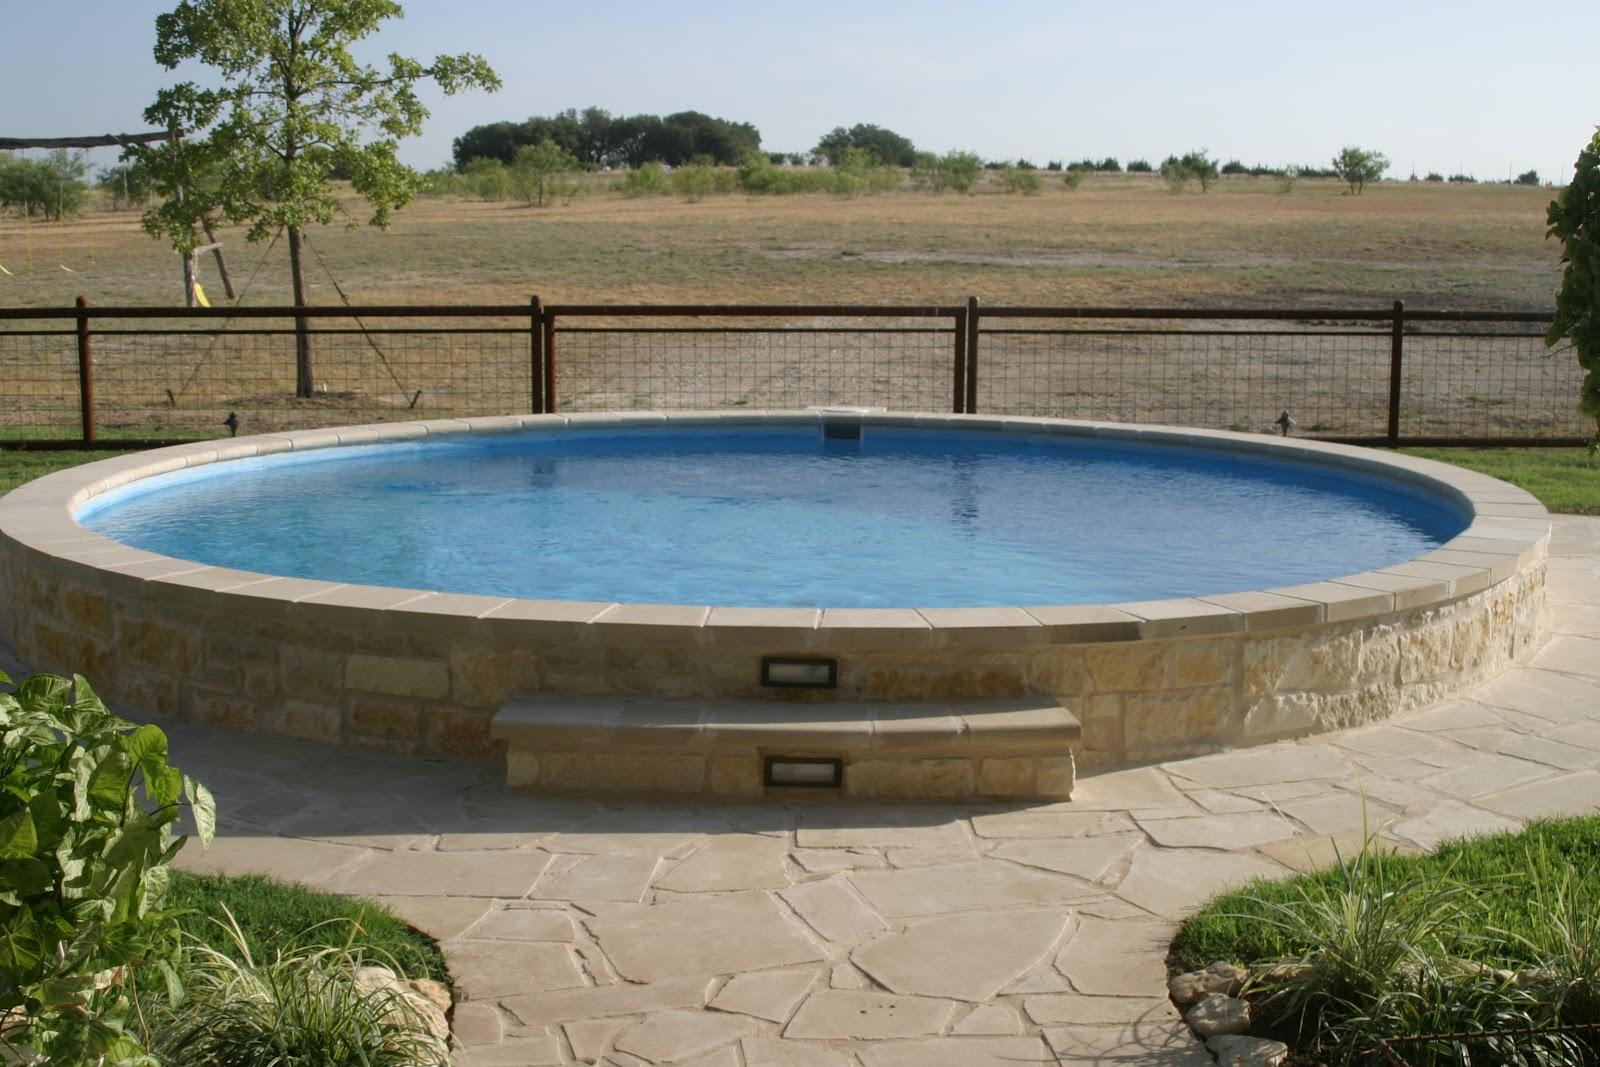 Tanks and troughs - Convert swimming pool to rainwater tank ...